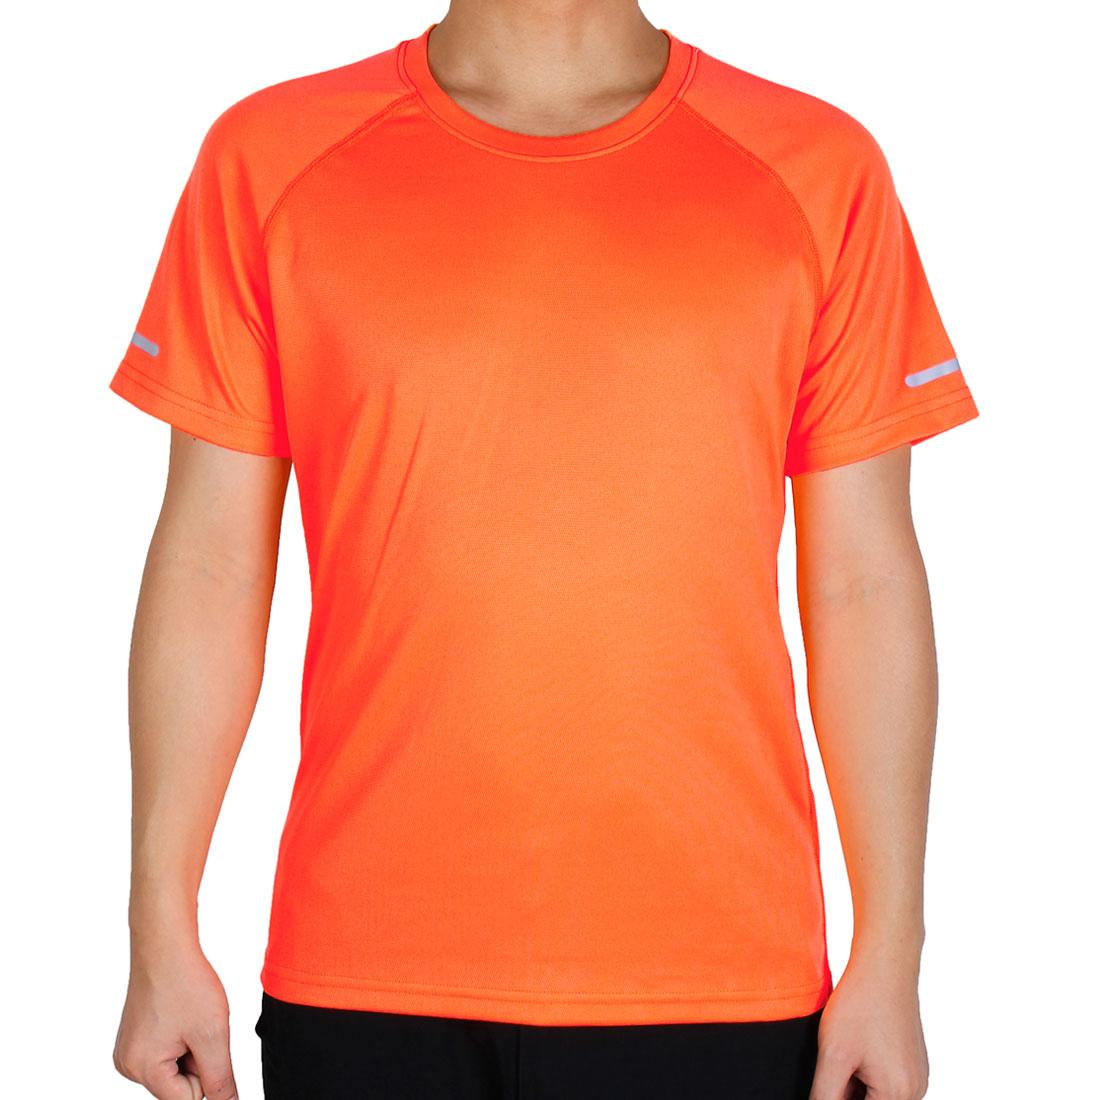 Men Moisture Wicking Short Sleeve Tee Outdoor Exercise Sports T-shirt Orange M